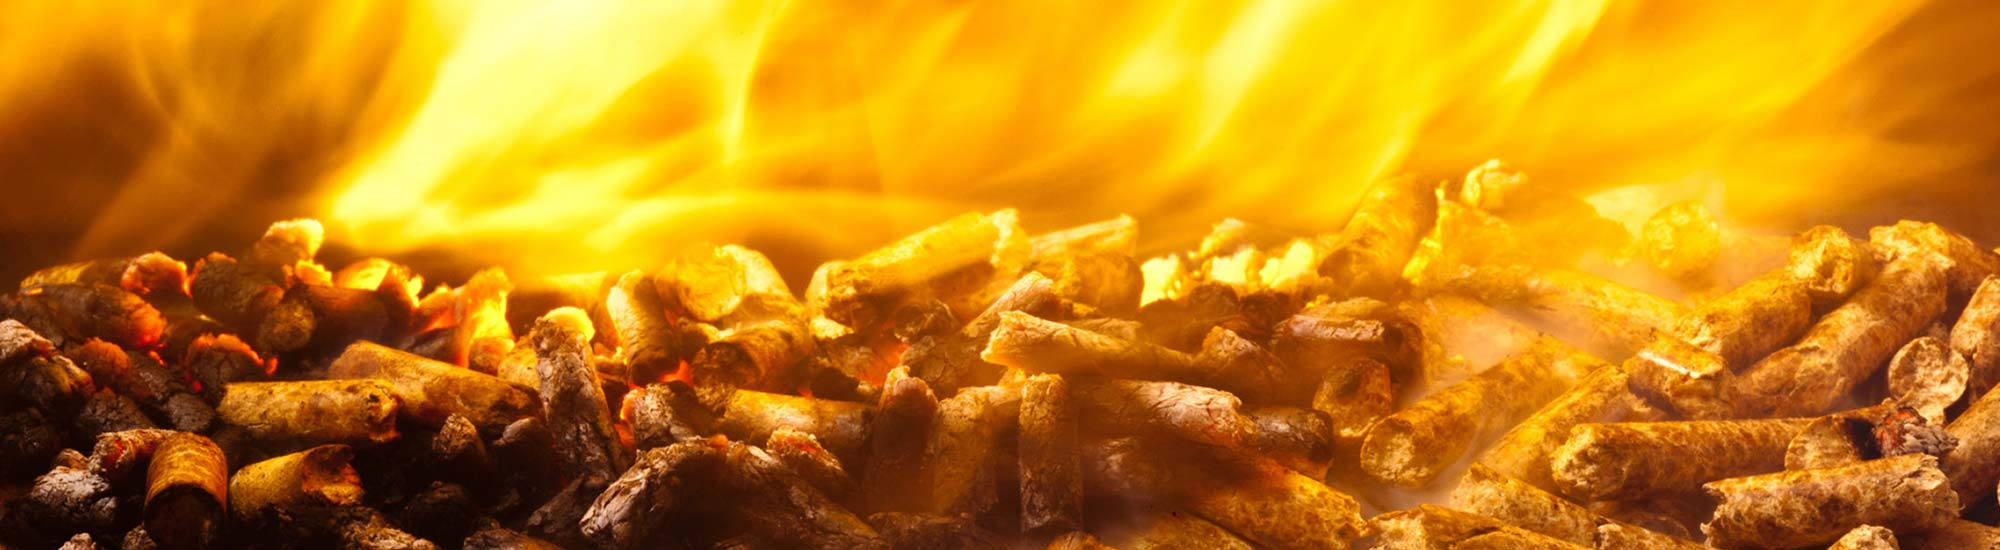 Brennende Pellets